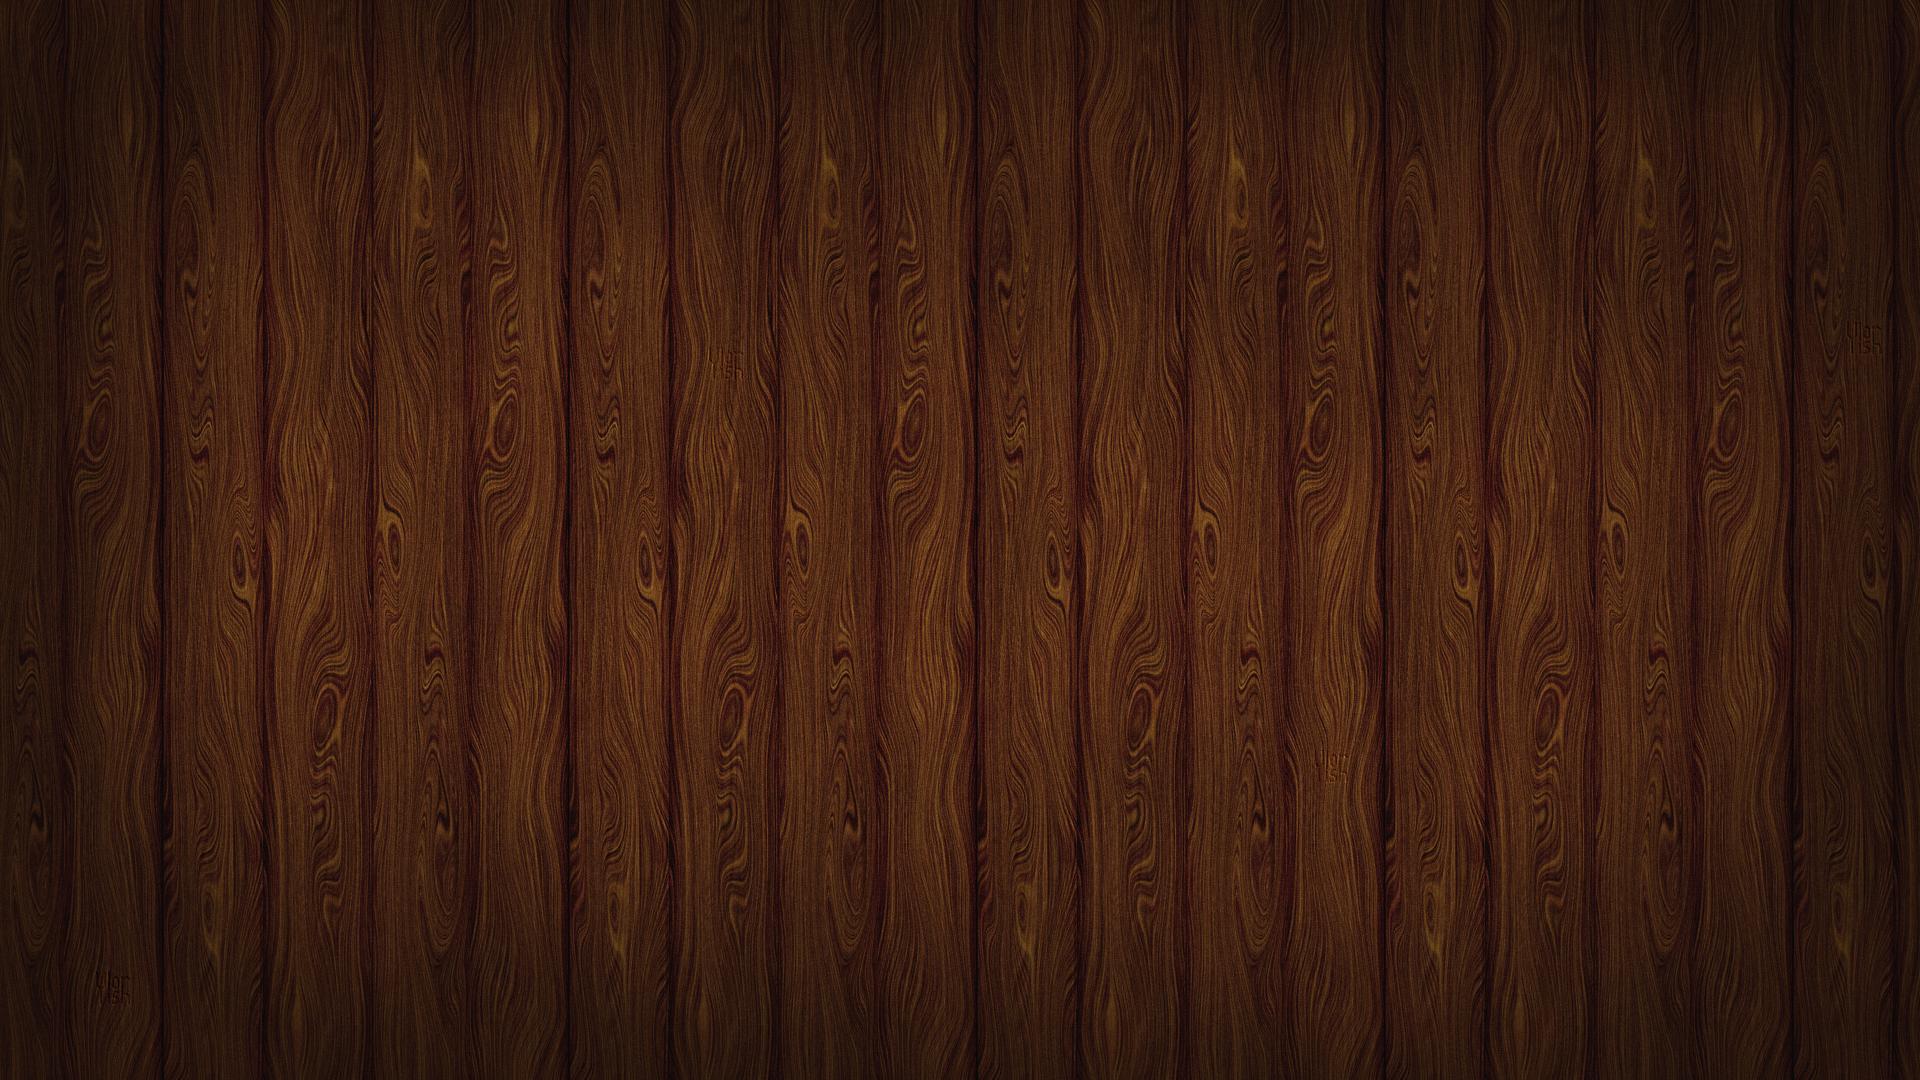 Wood Textures Wallpaper 1920x1080 Wood Textures 1920x1080